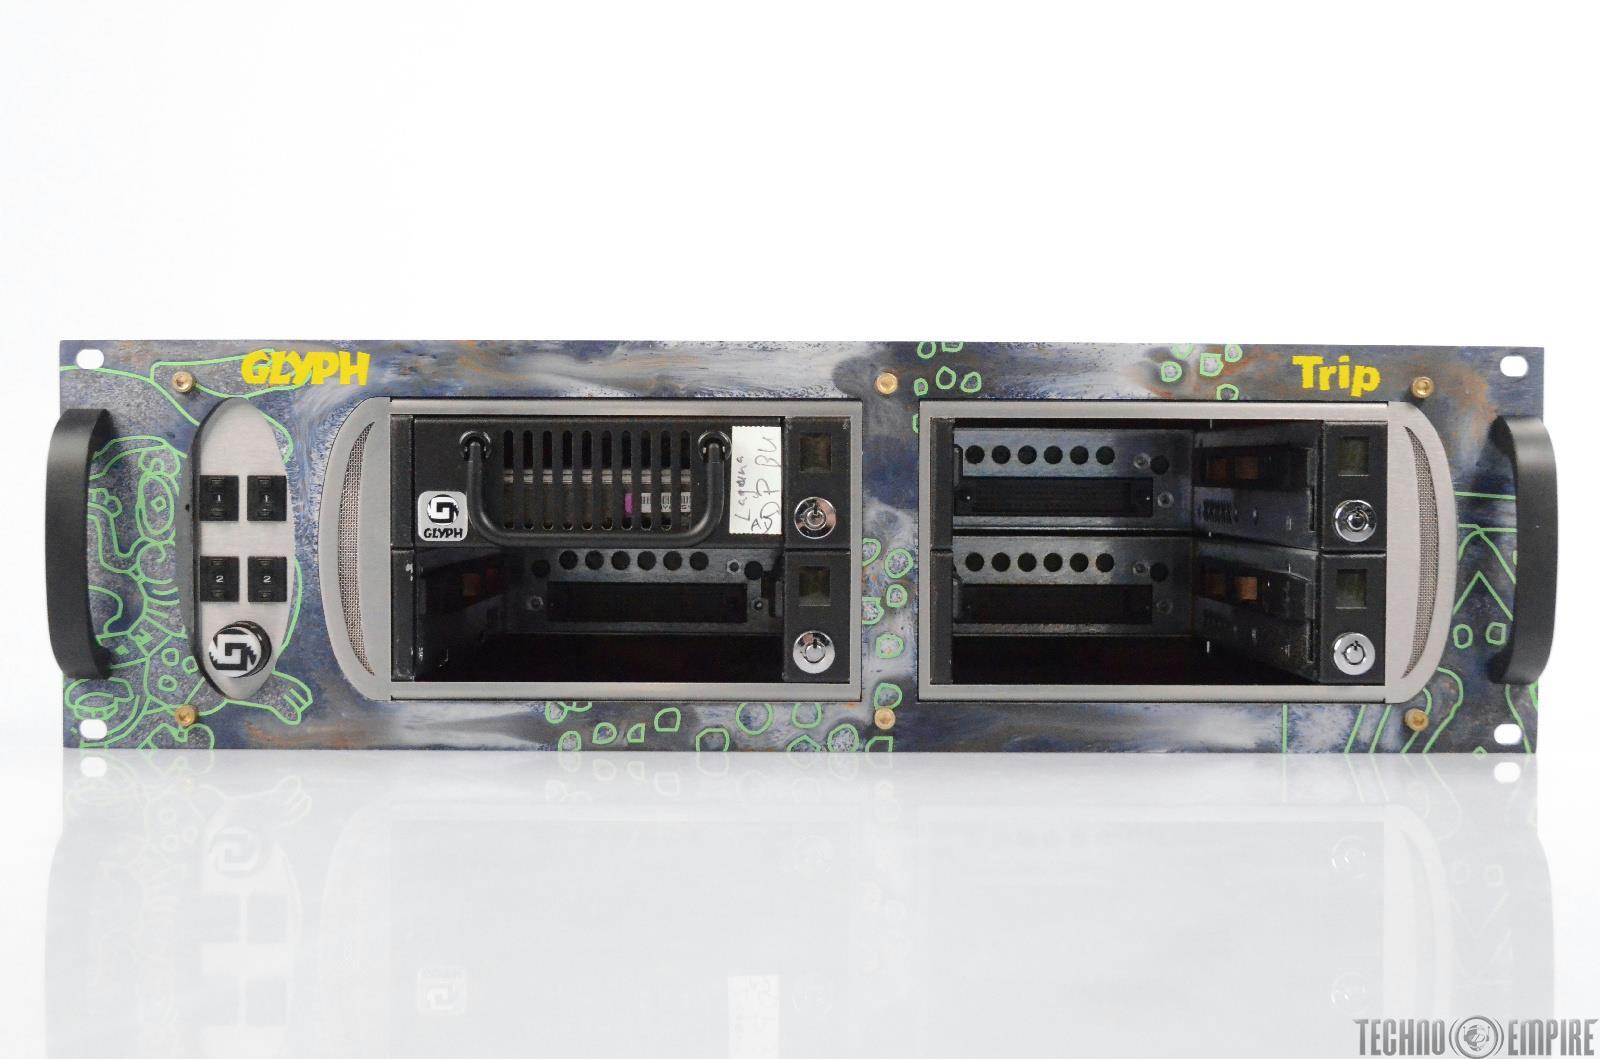 Glyph Trip 4-Slot External Hard Drive Rack w/ Seagate ST3146807LW 147GB #30820